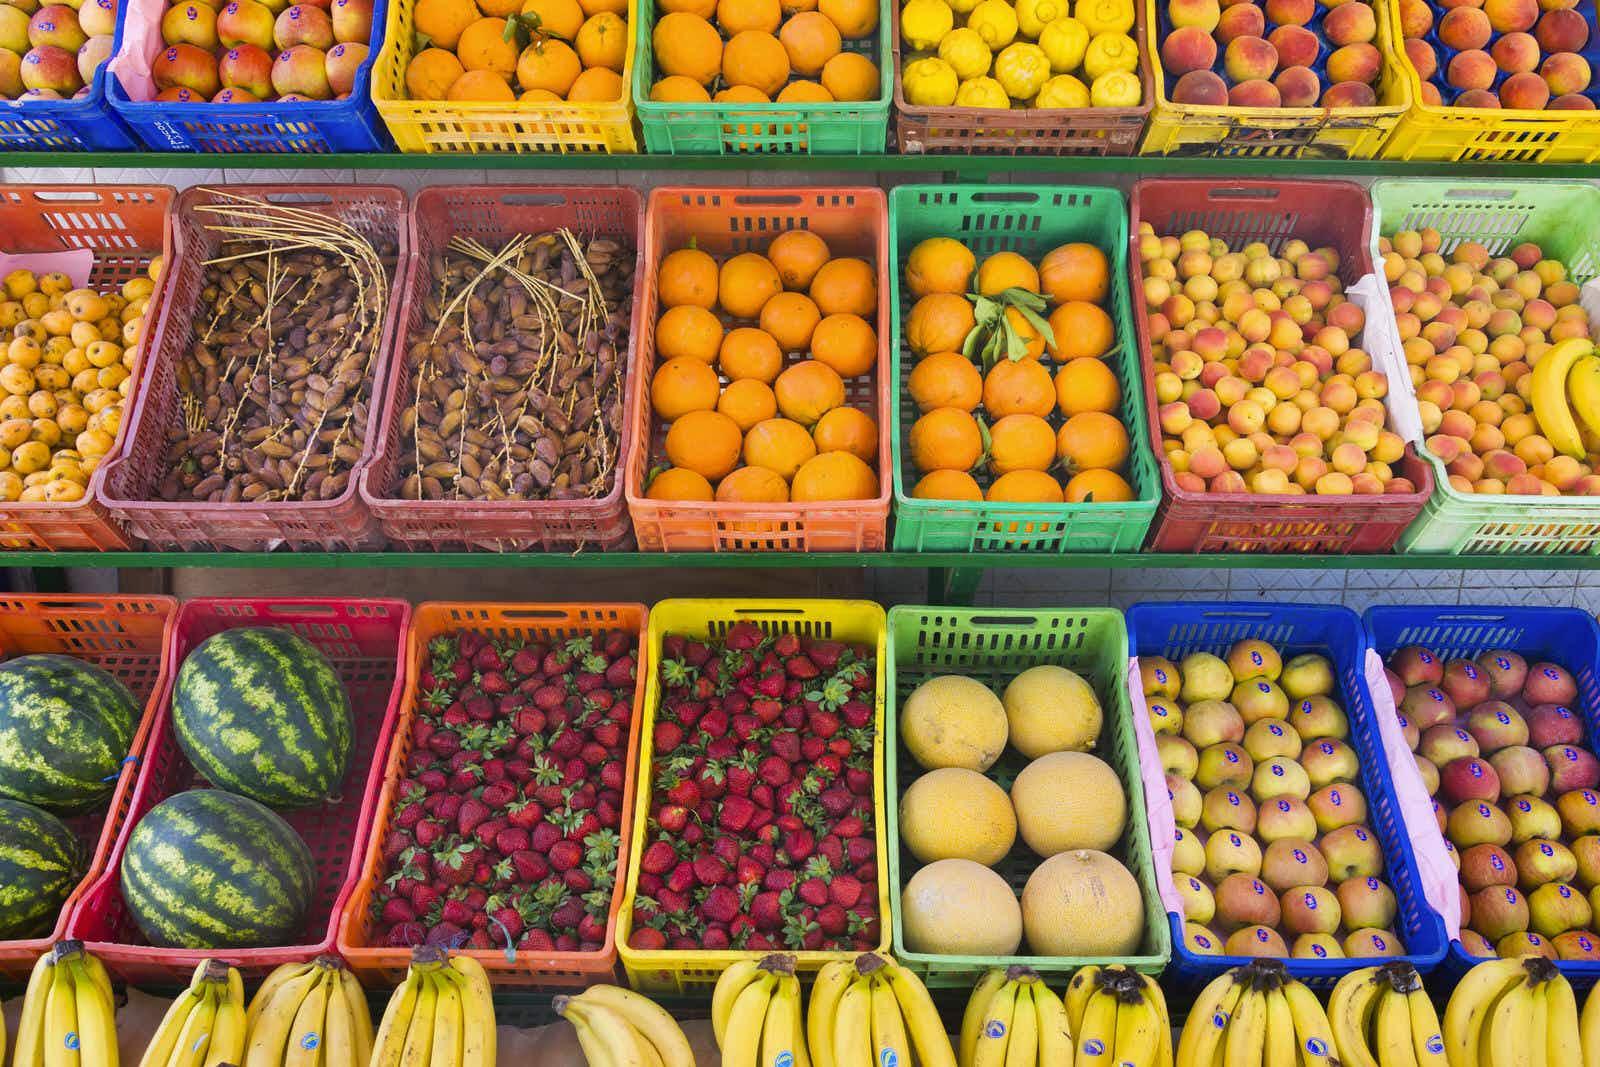 Selling fruit at the market, Hammamet, Tunisia